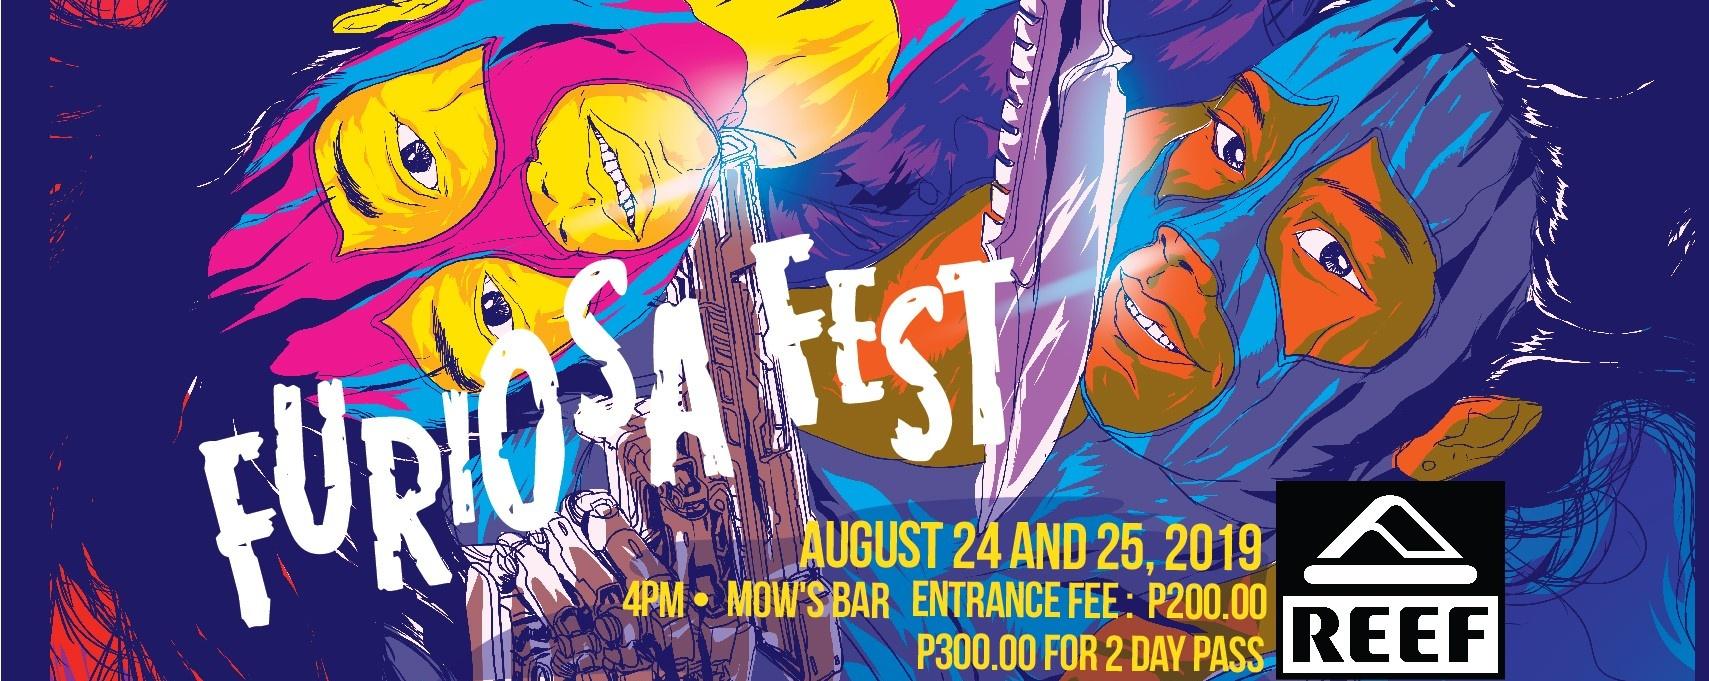 Furiosa Fest : Furiosa 2nd Year Anniversary